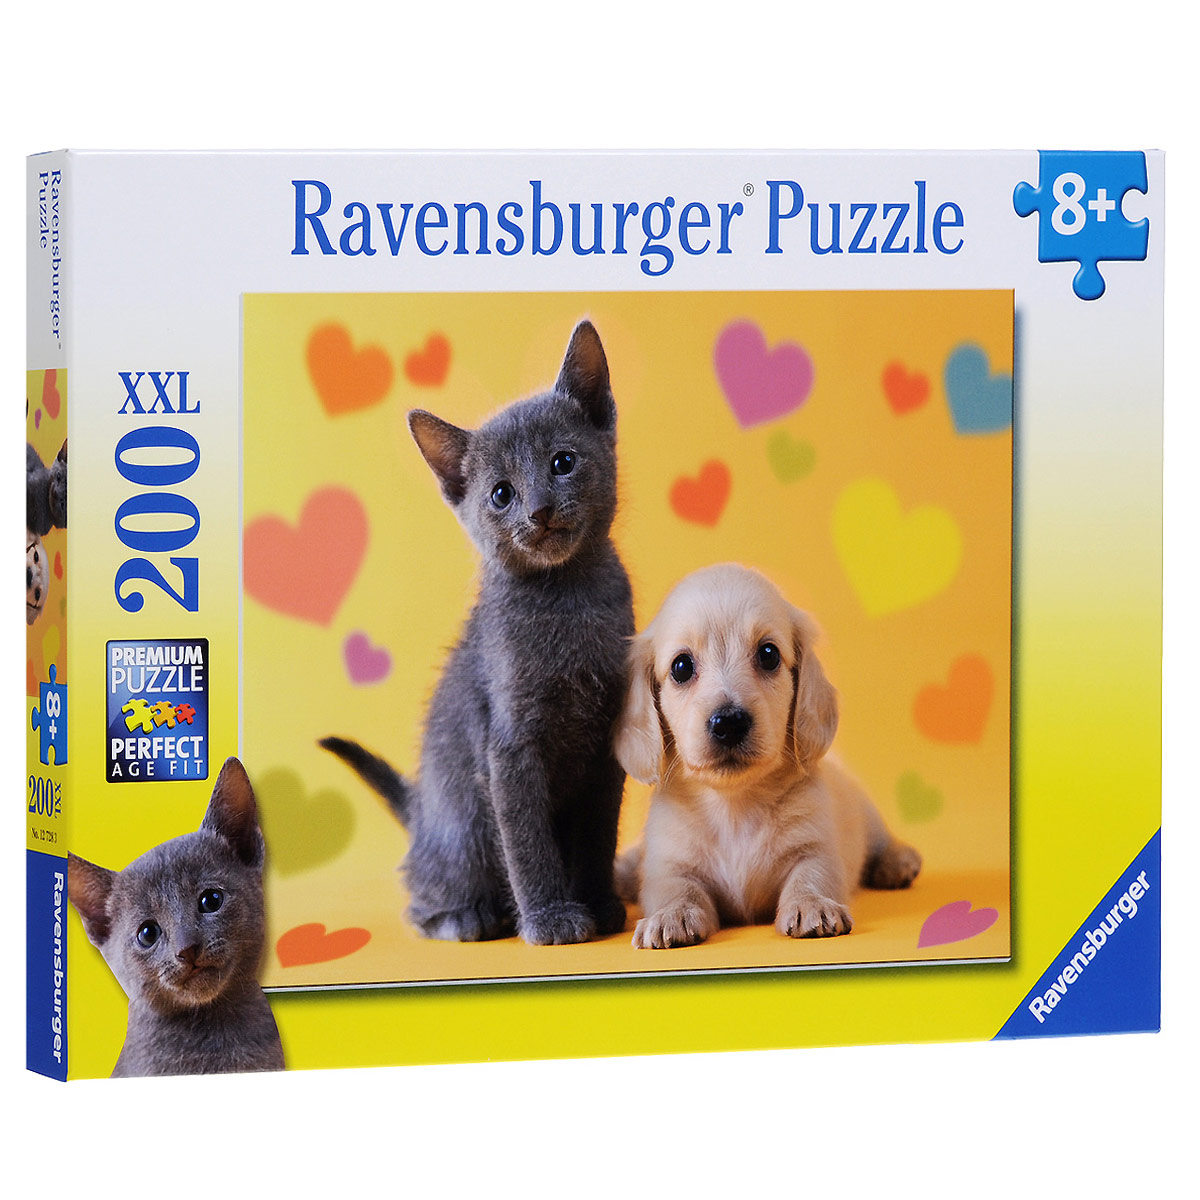 Ravensburger Неразлучные друзья. Пазл XXL, 200 элементов